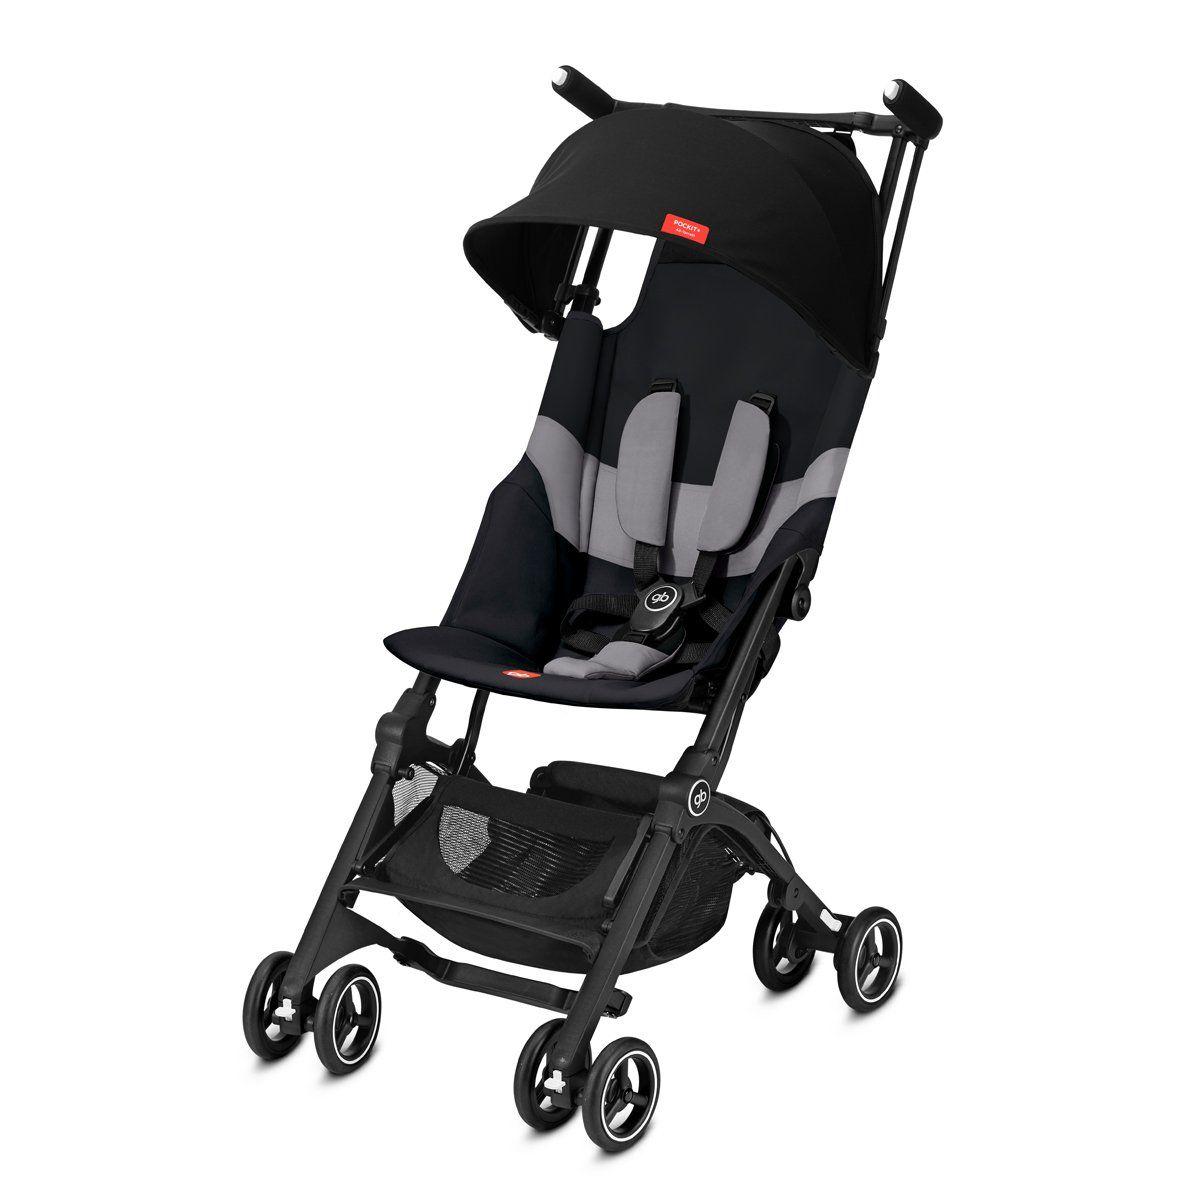 GB Pockit Plus All-Terrain Stroller | Baby car seats, Baby ...